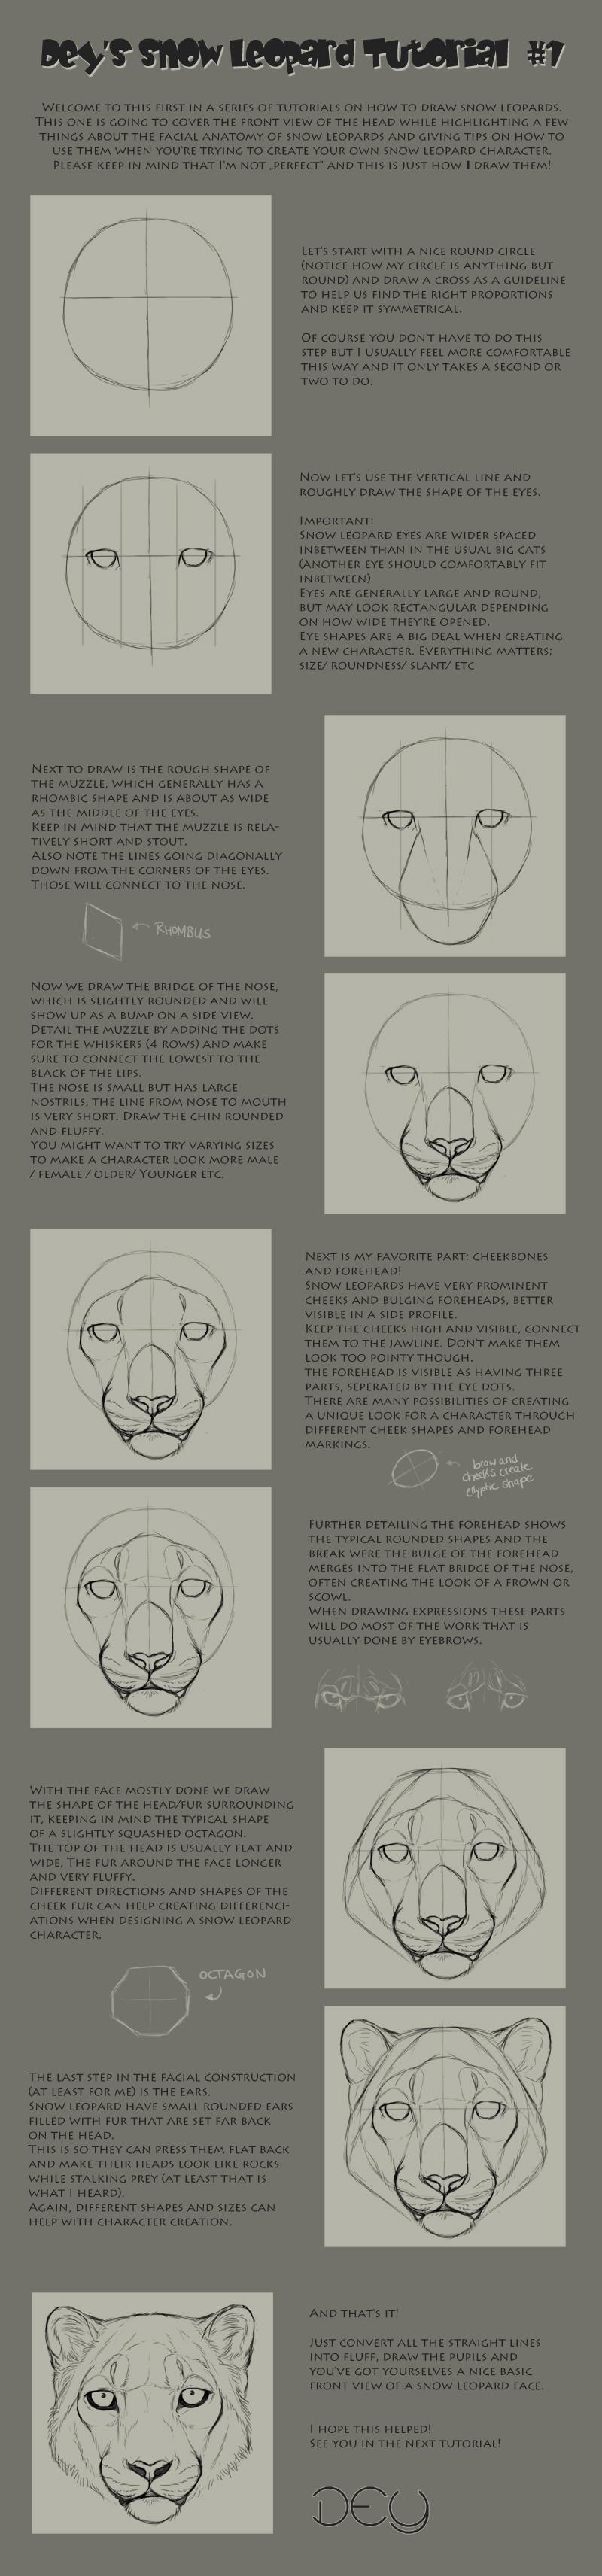 Tutorial: Snow Leopard Head #1 by DeyVarah